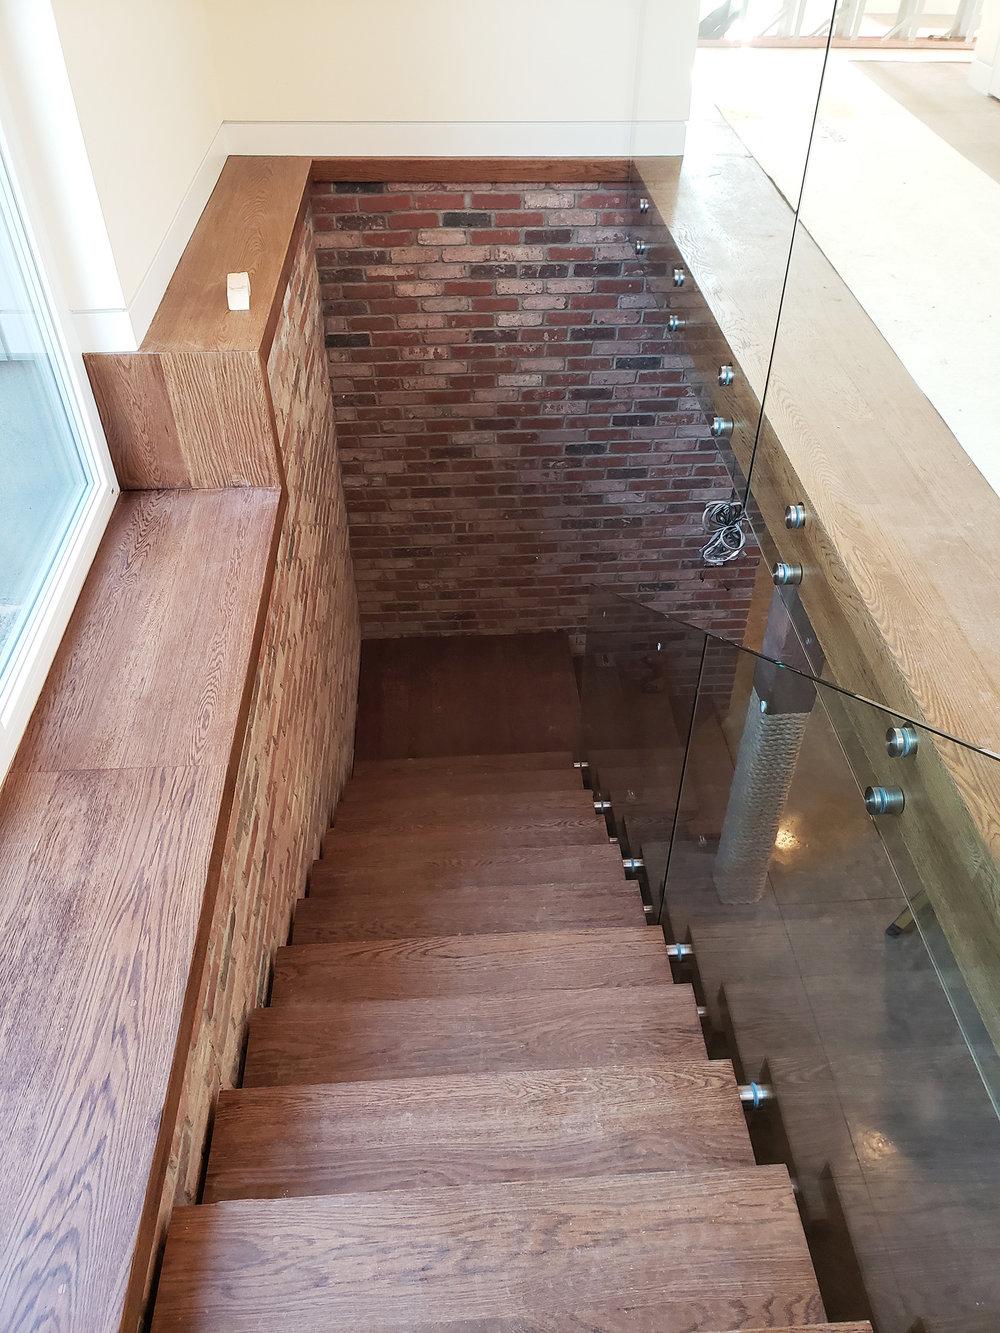 McCabe bolgar staircase with glass 3.28.19.jpg